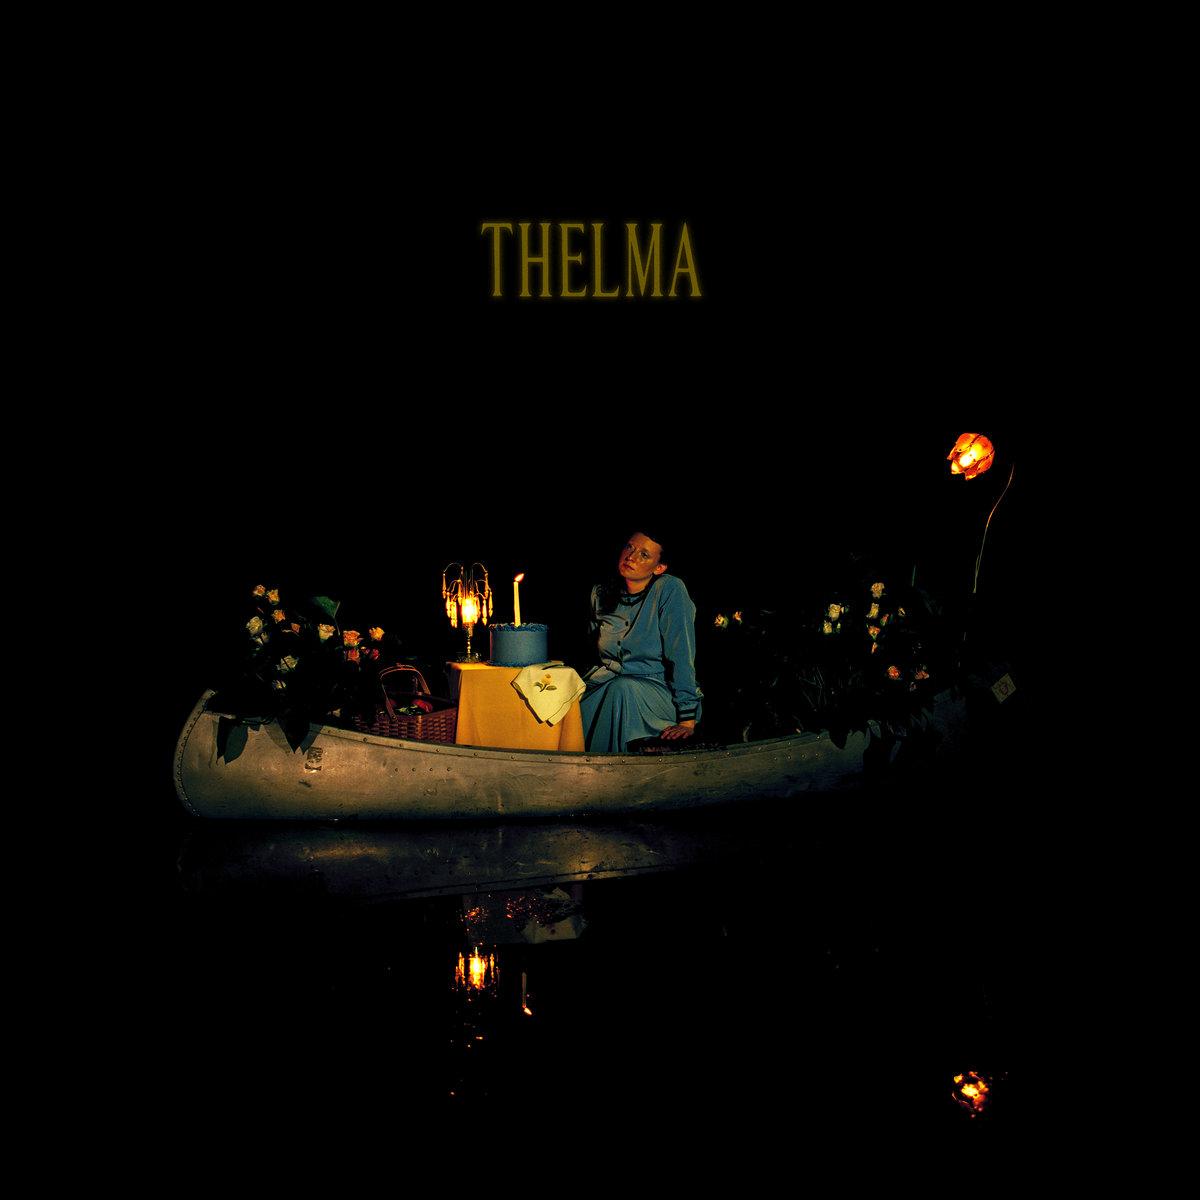 thelma cover.jpg